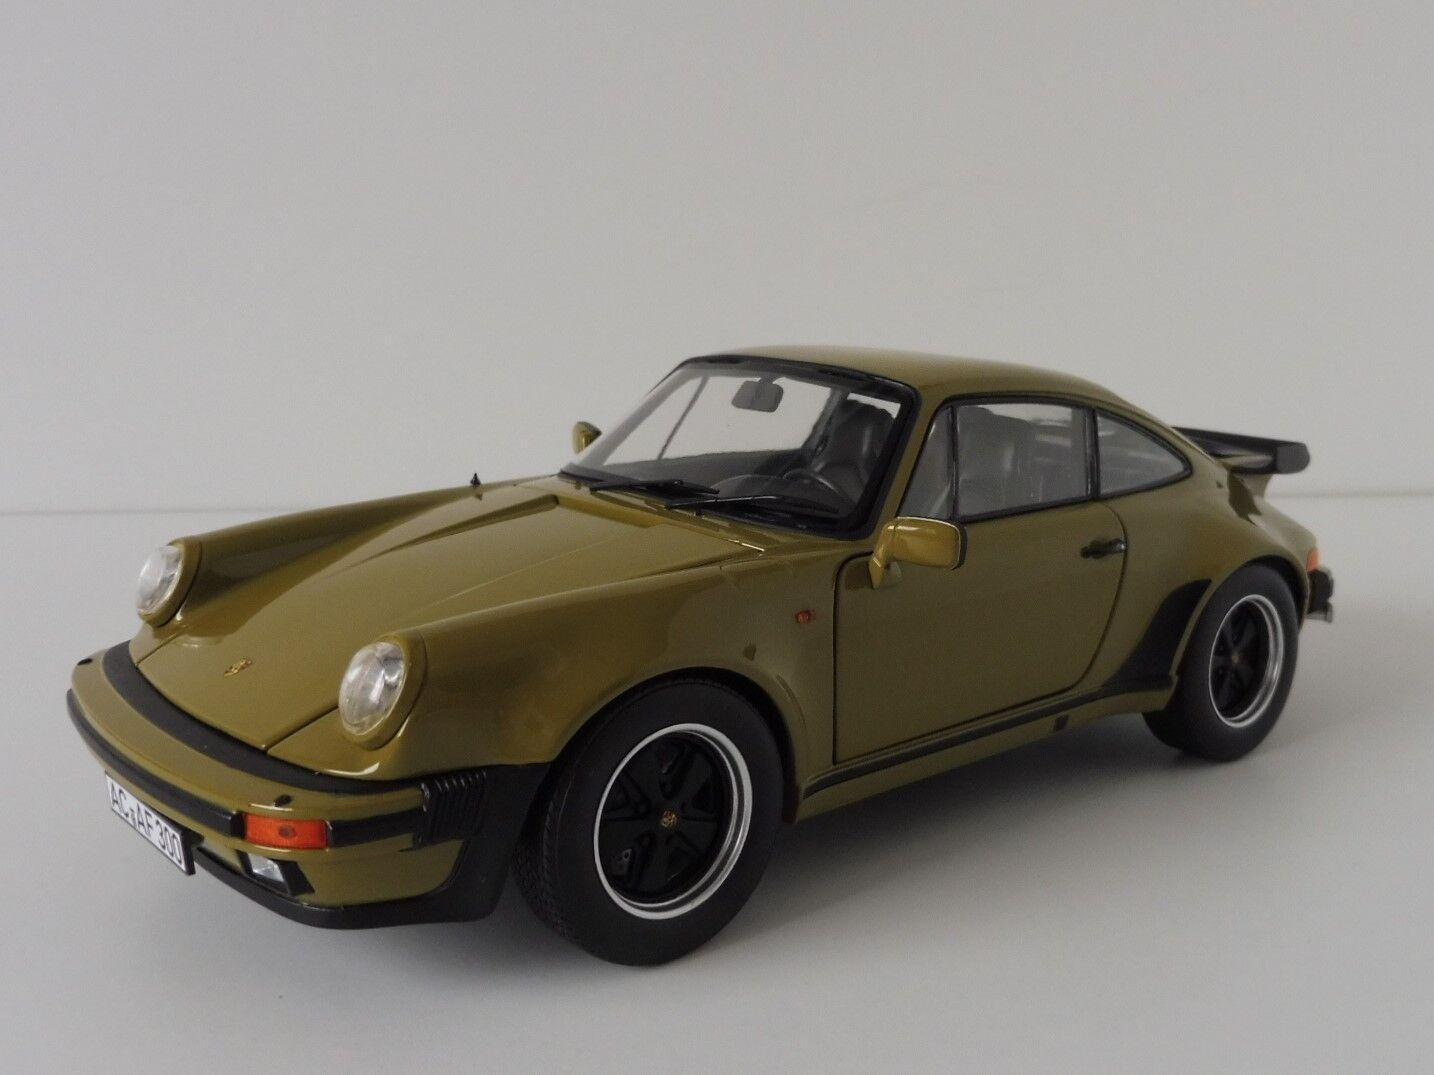 Porsche 911 Turbo 3.3 1977 olive 1 18 NOREV 187575 G-modèle 1963